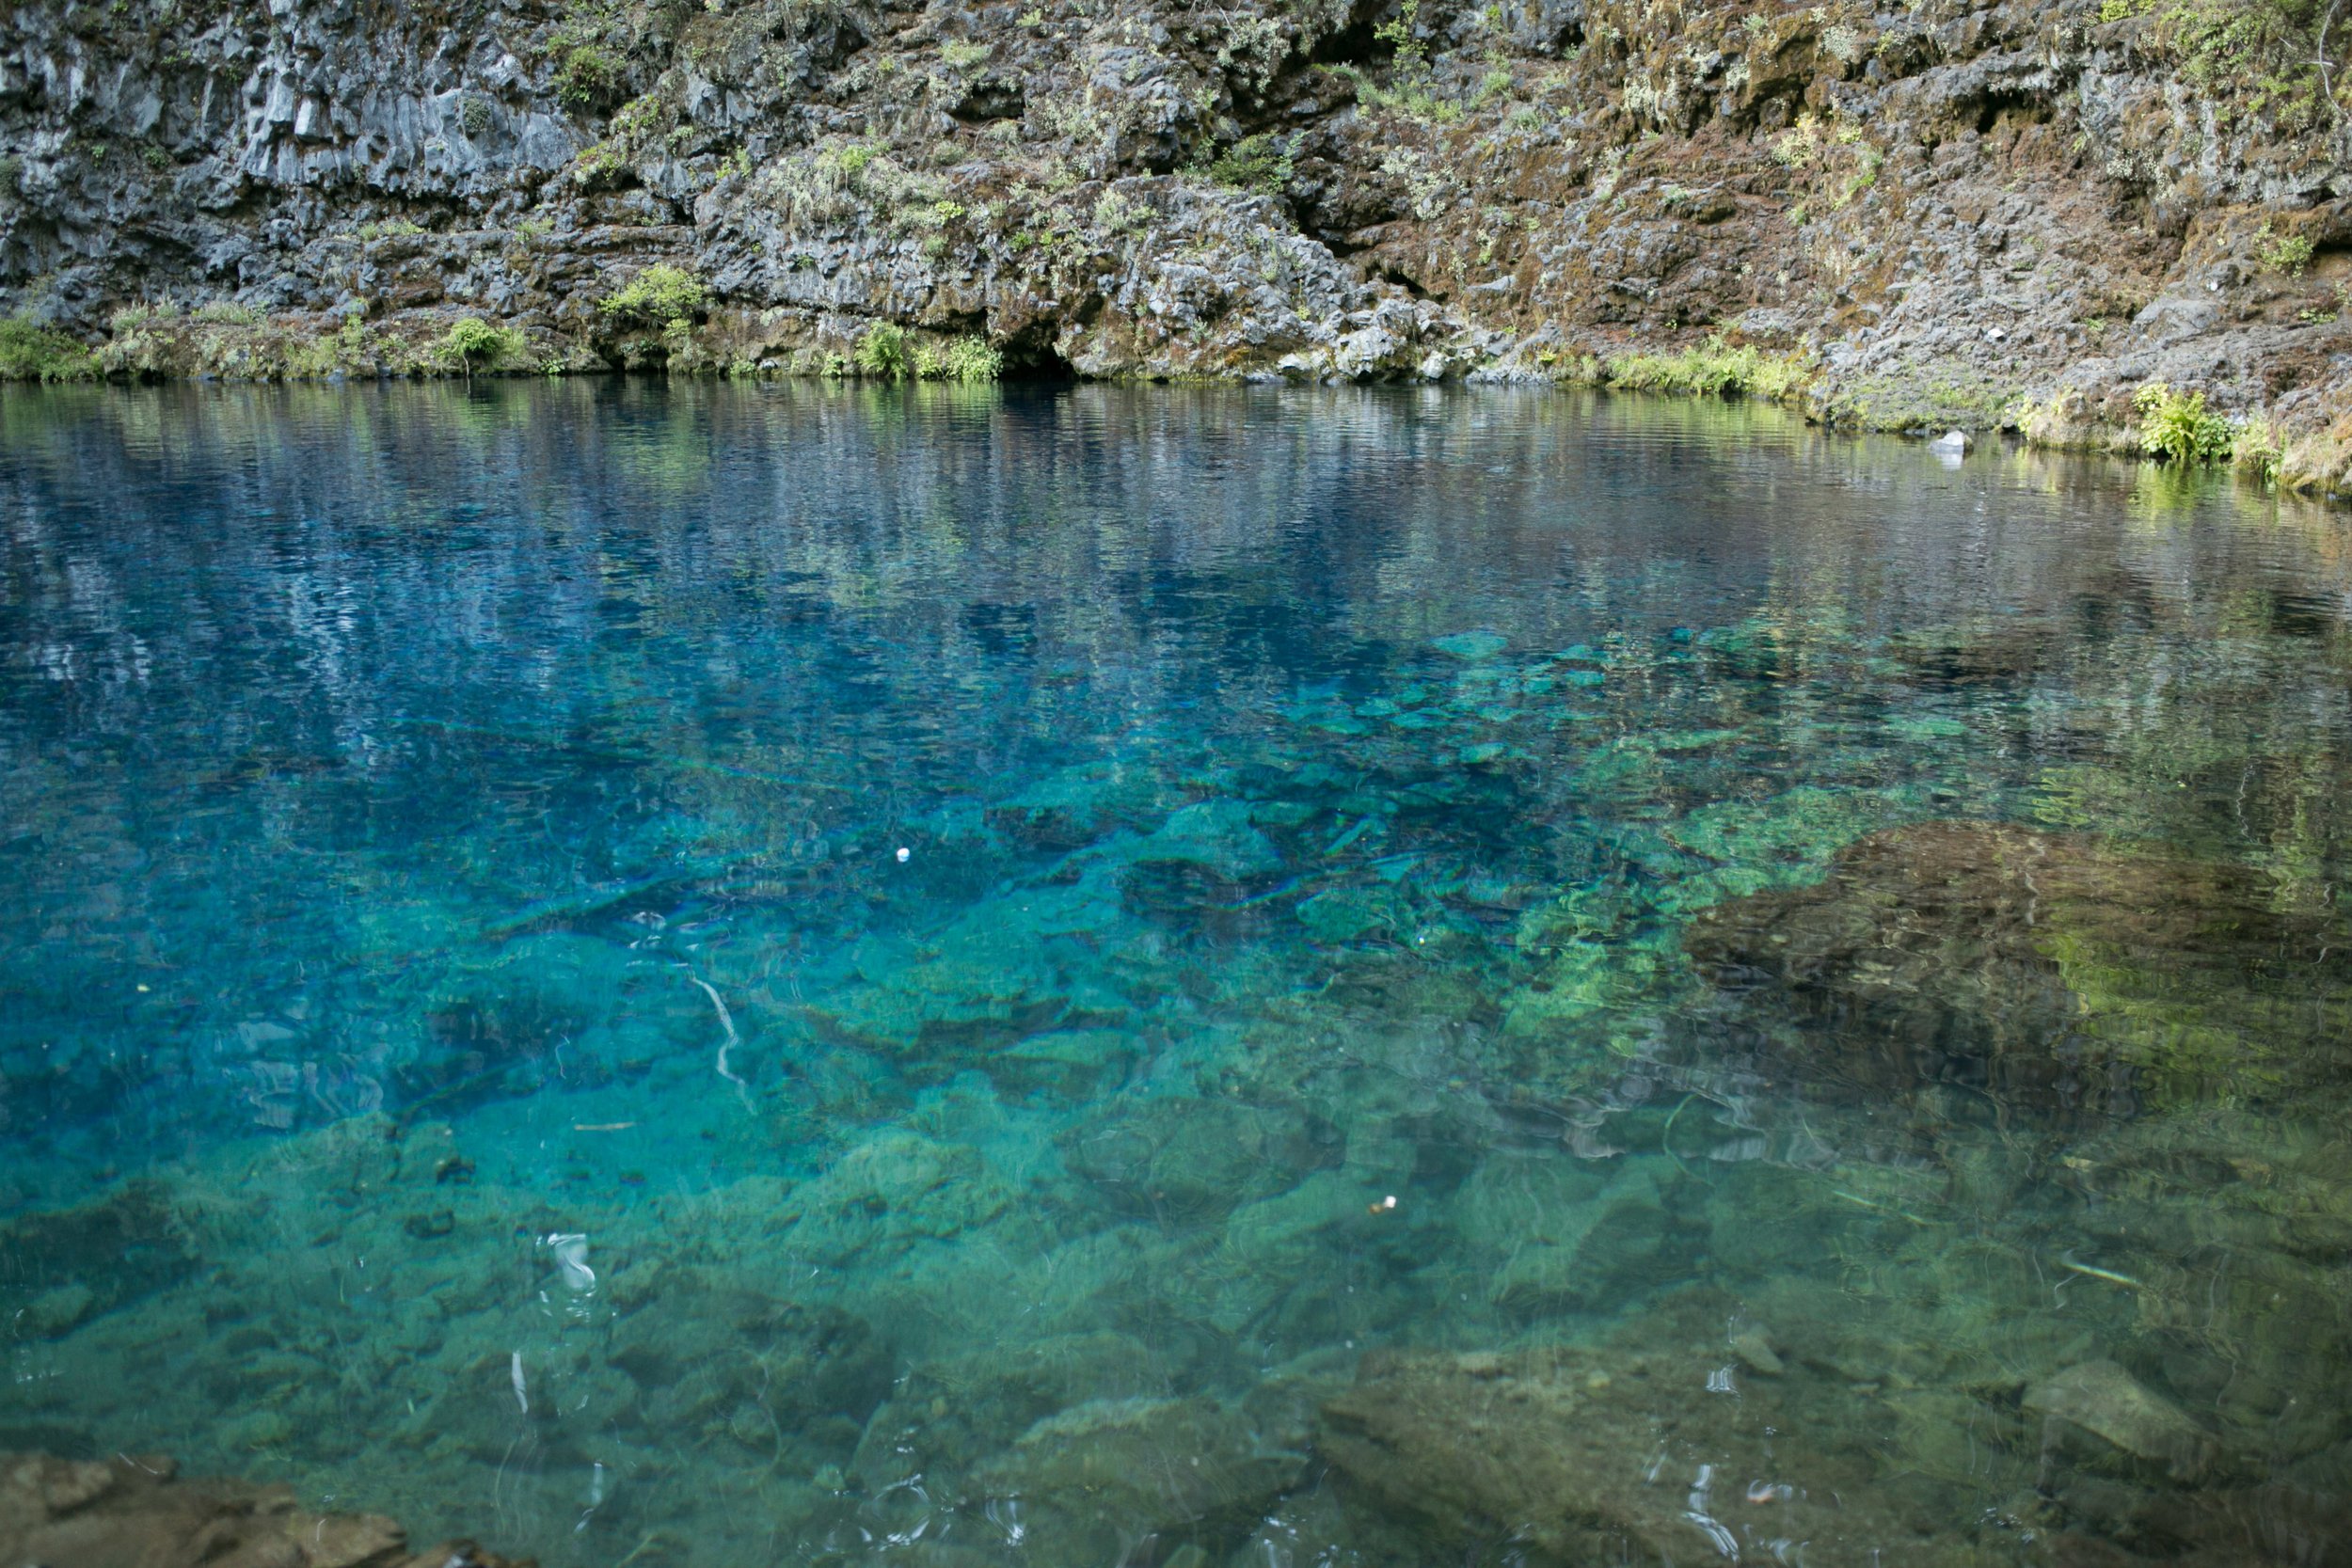 029Travel_Adventure_Photography_Outlive_Creative_Oregon_Tamolitch_Blue_Pool.jpg